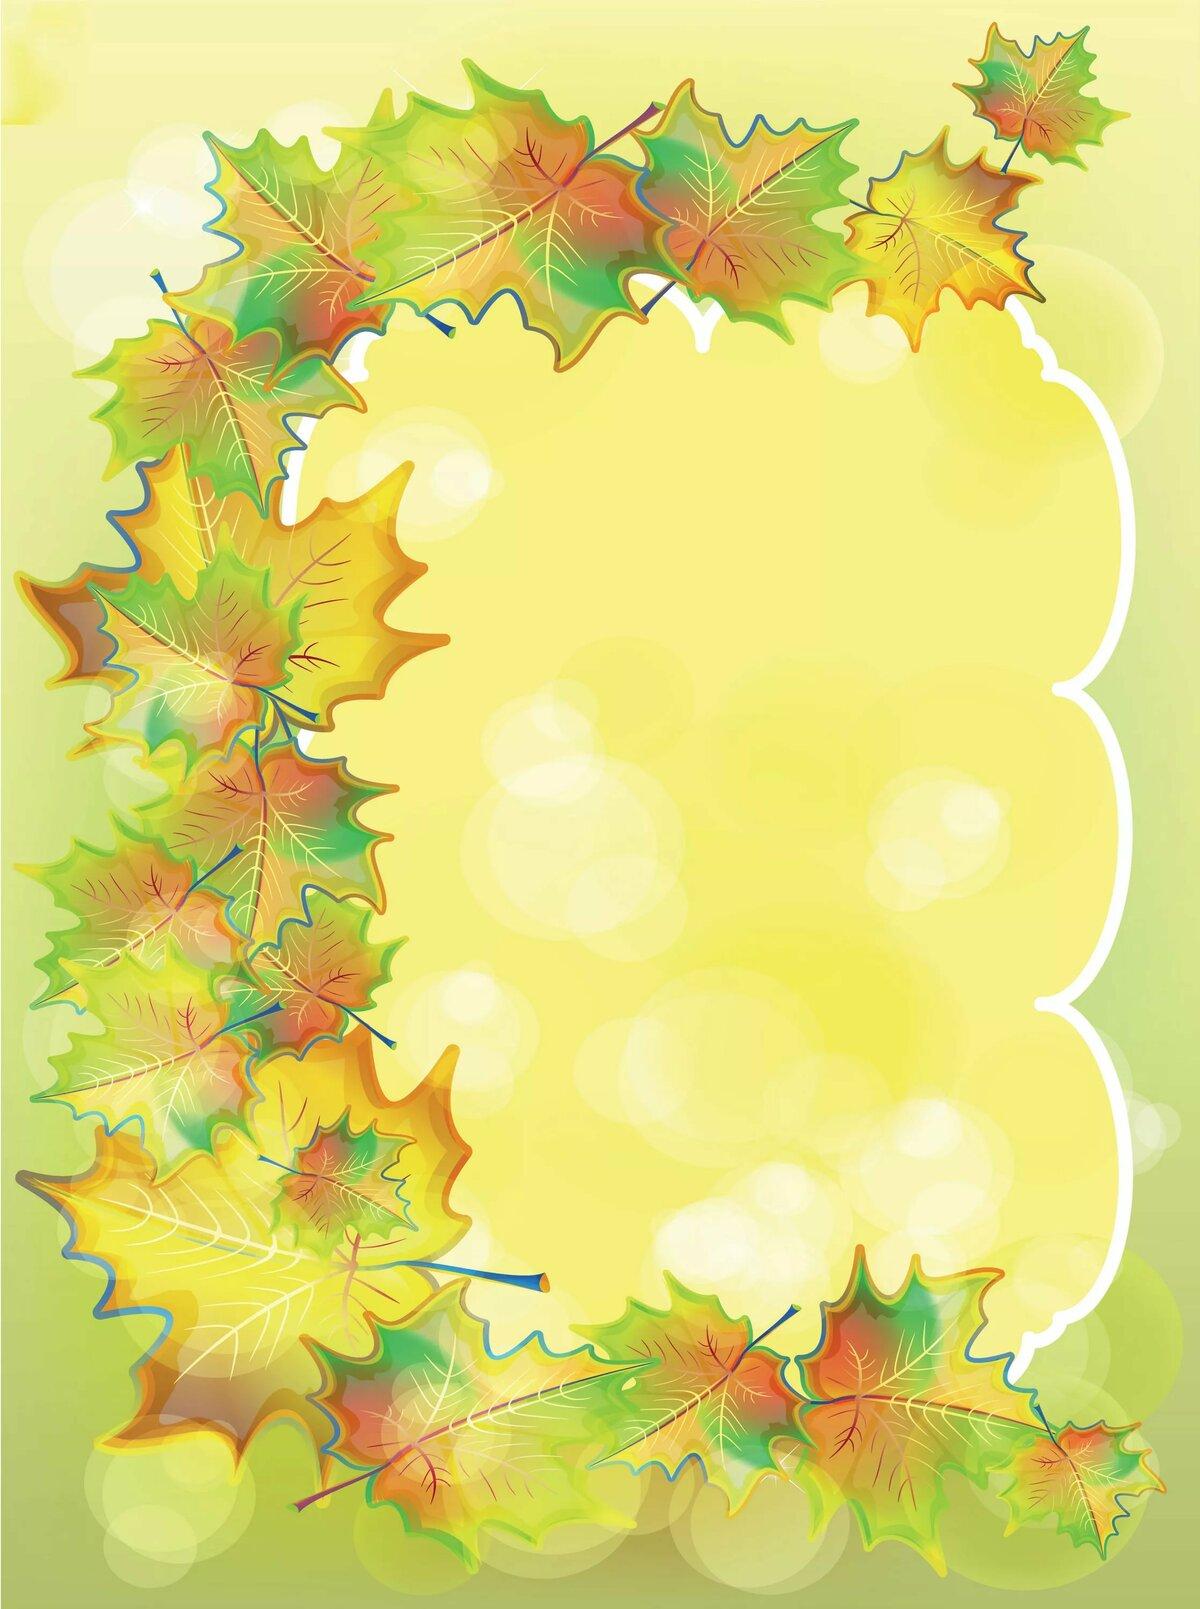 Картинки осень без текста, рисунки кухню новым